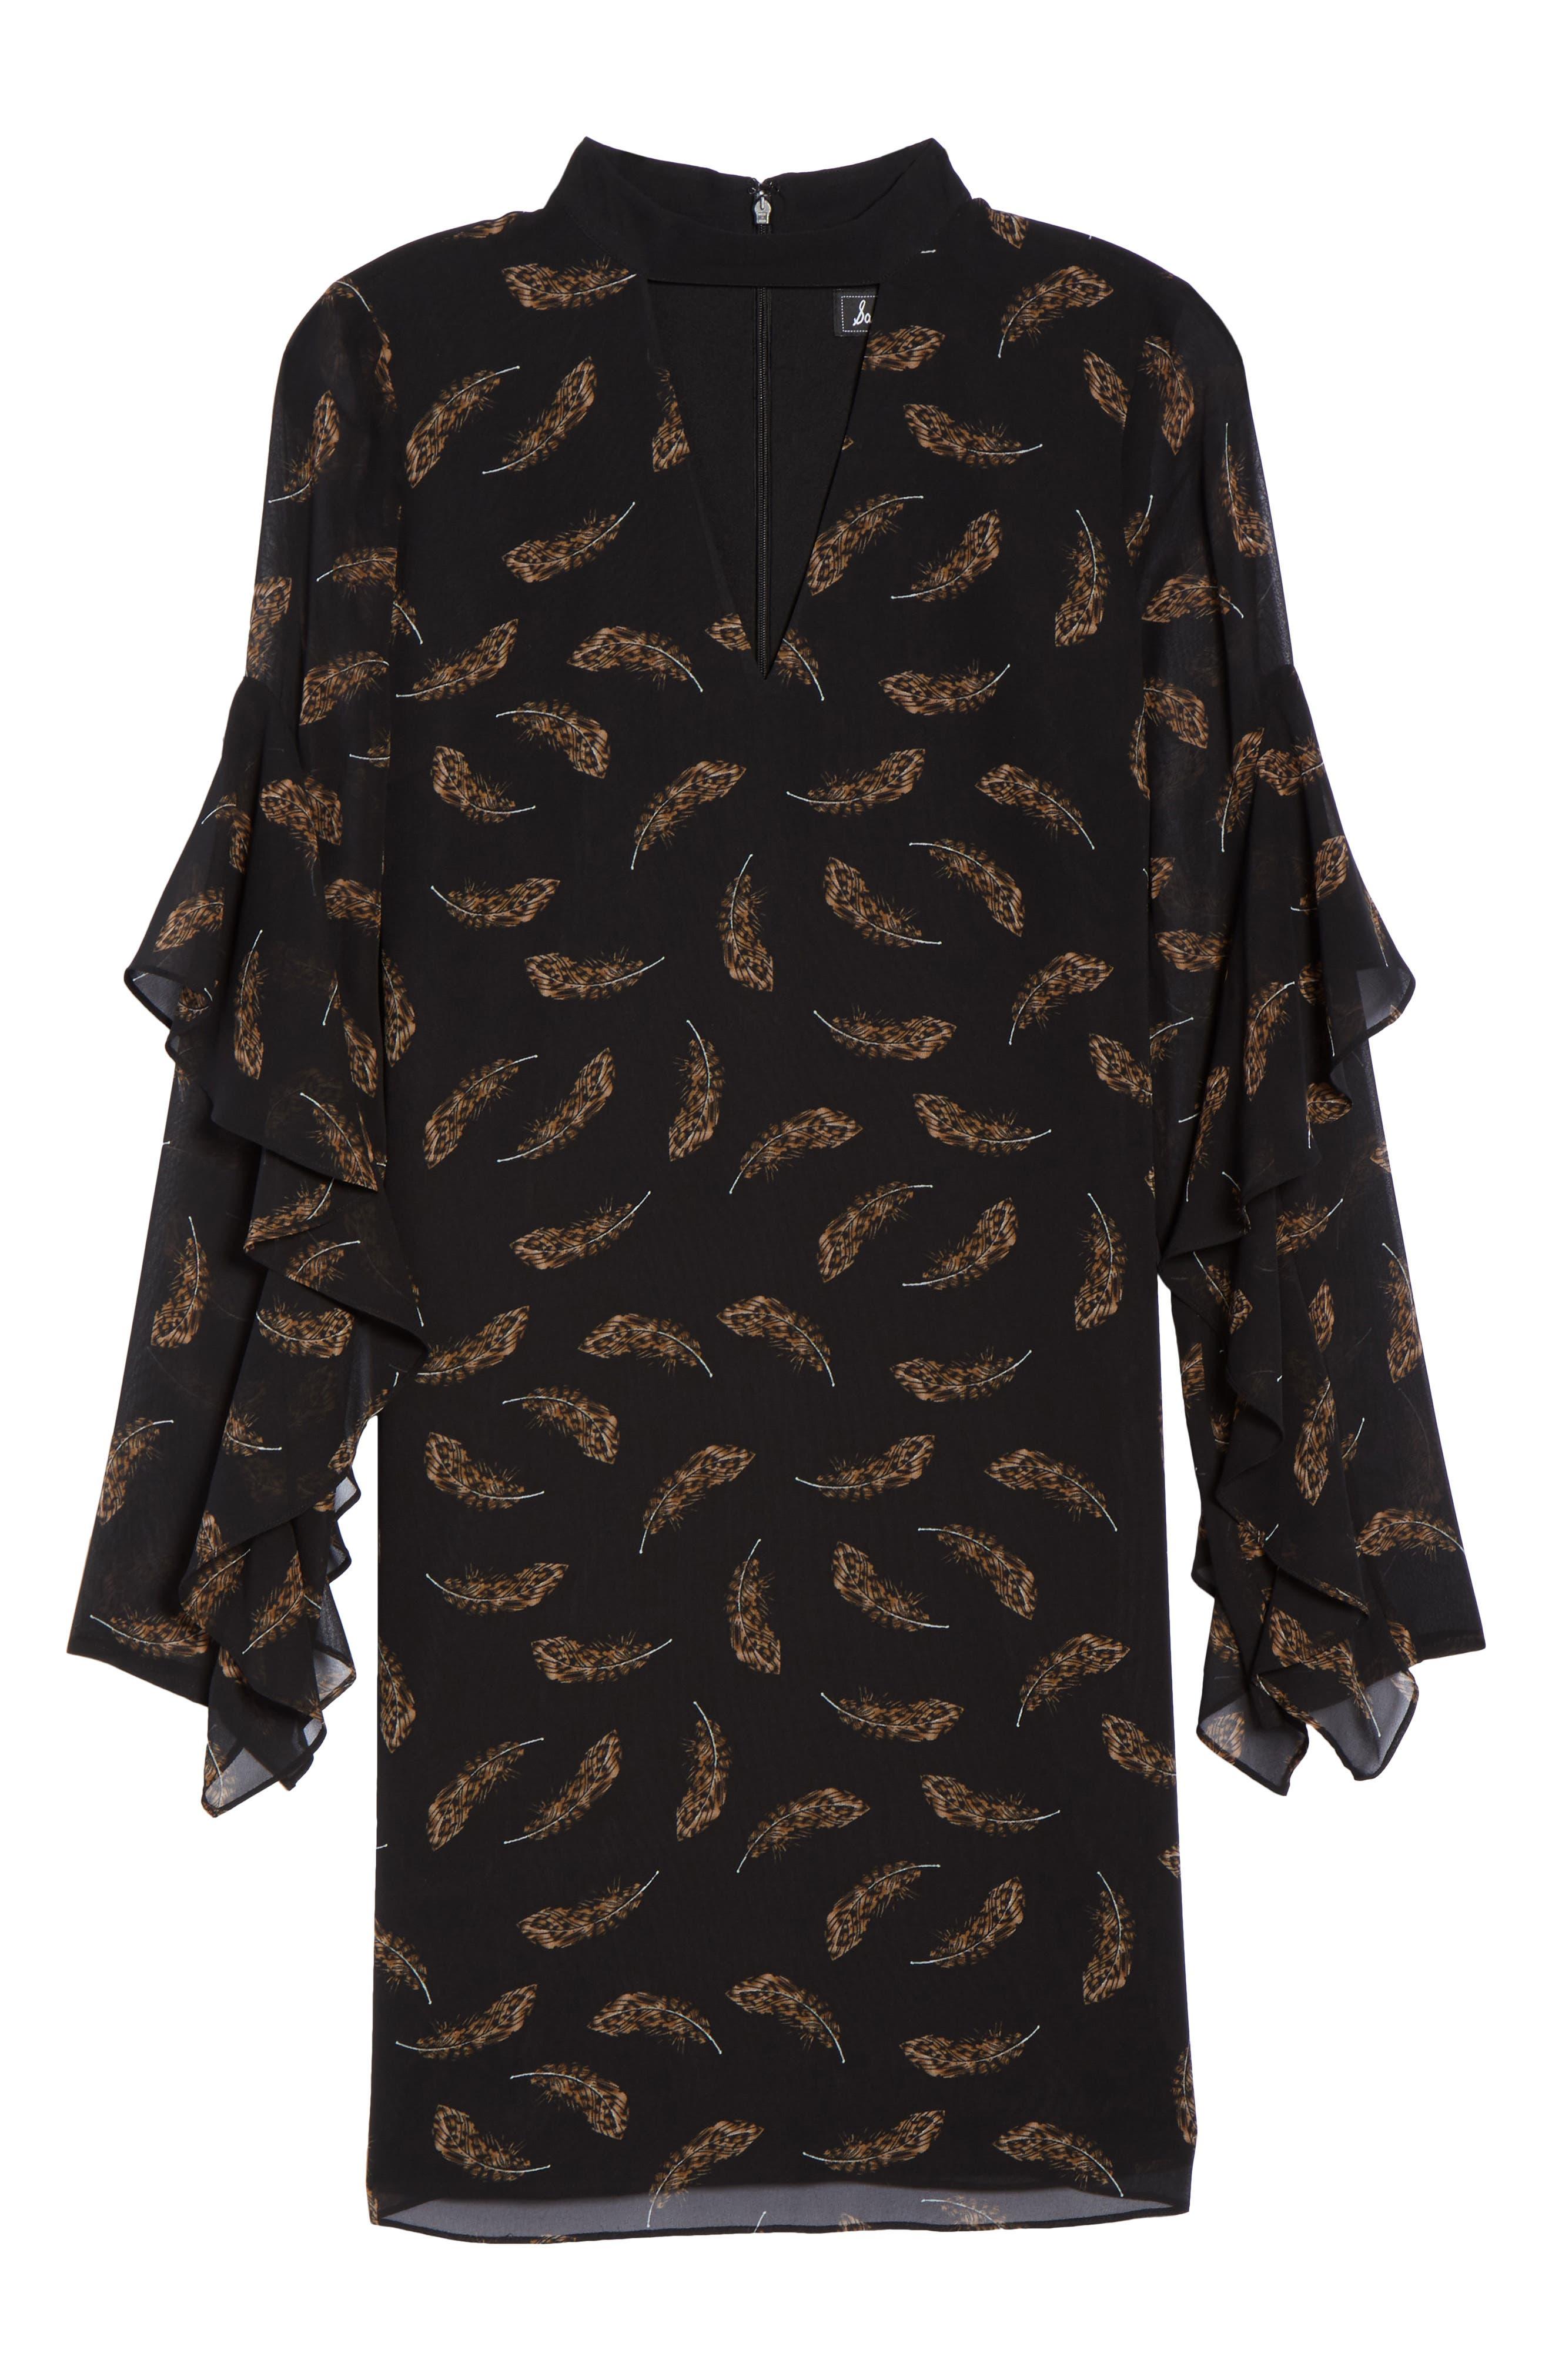 Feather Print Choker Collar Dress,                             Alternate thumbnail 6, color,                             007